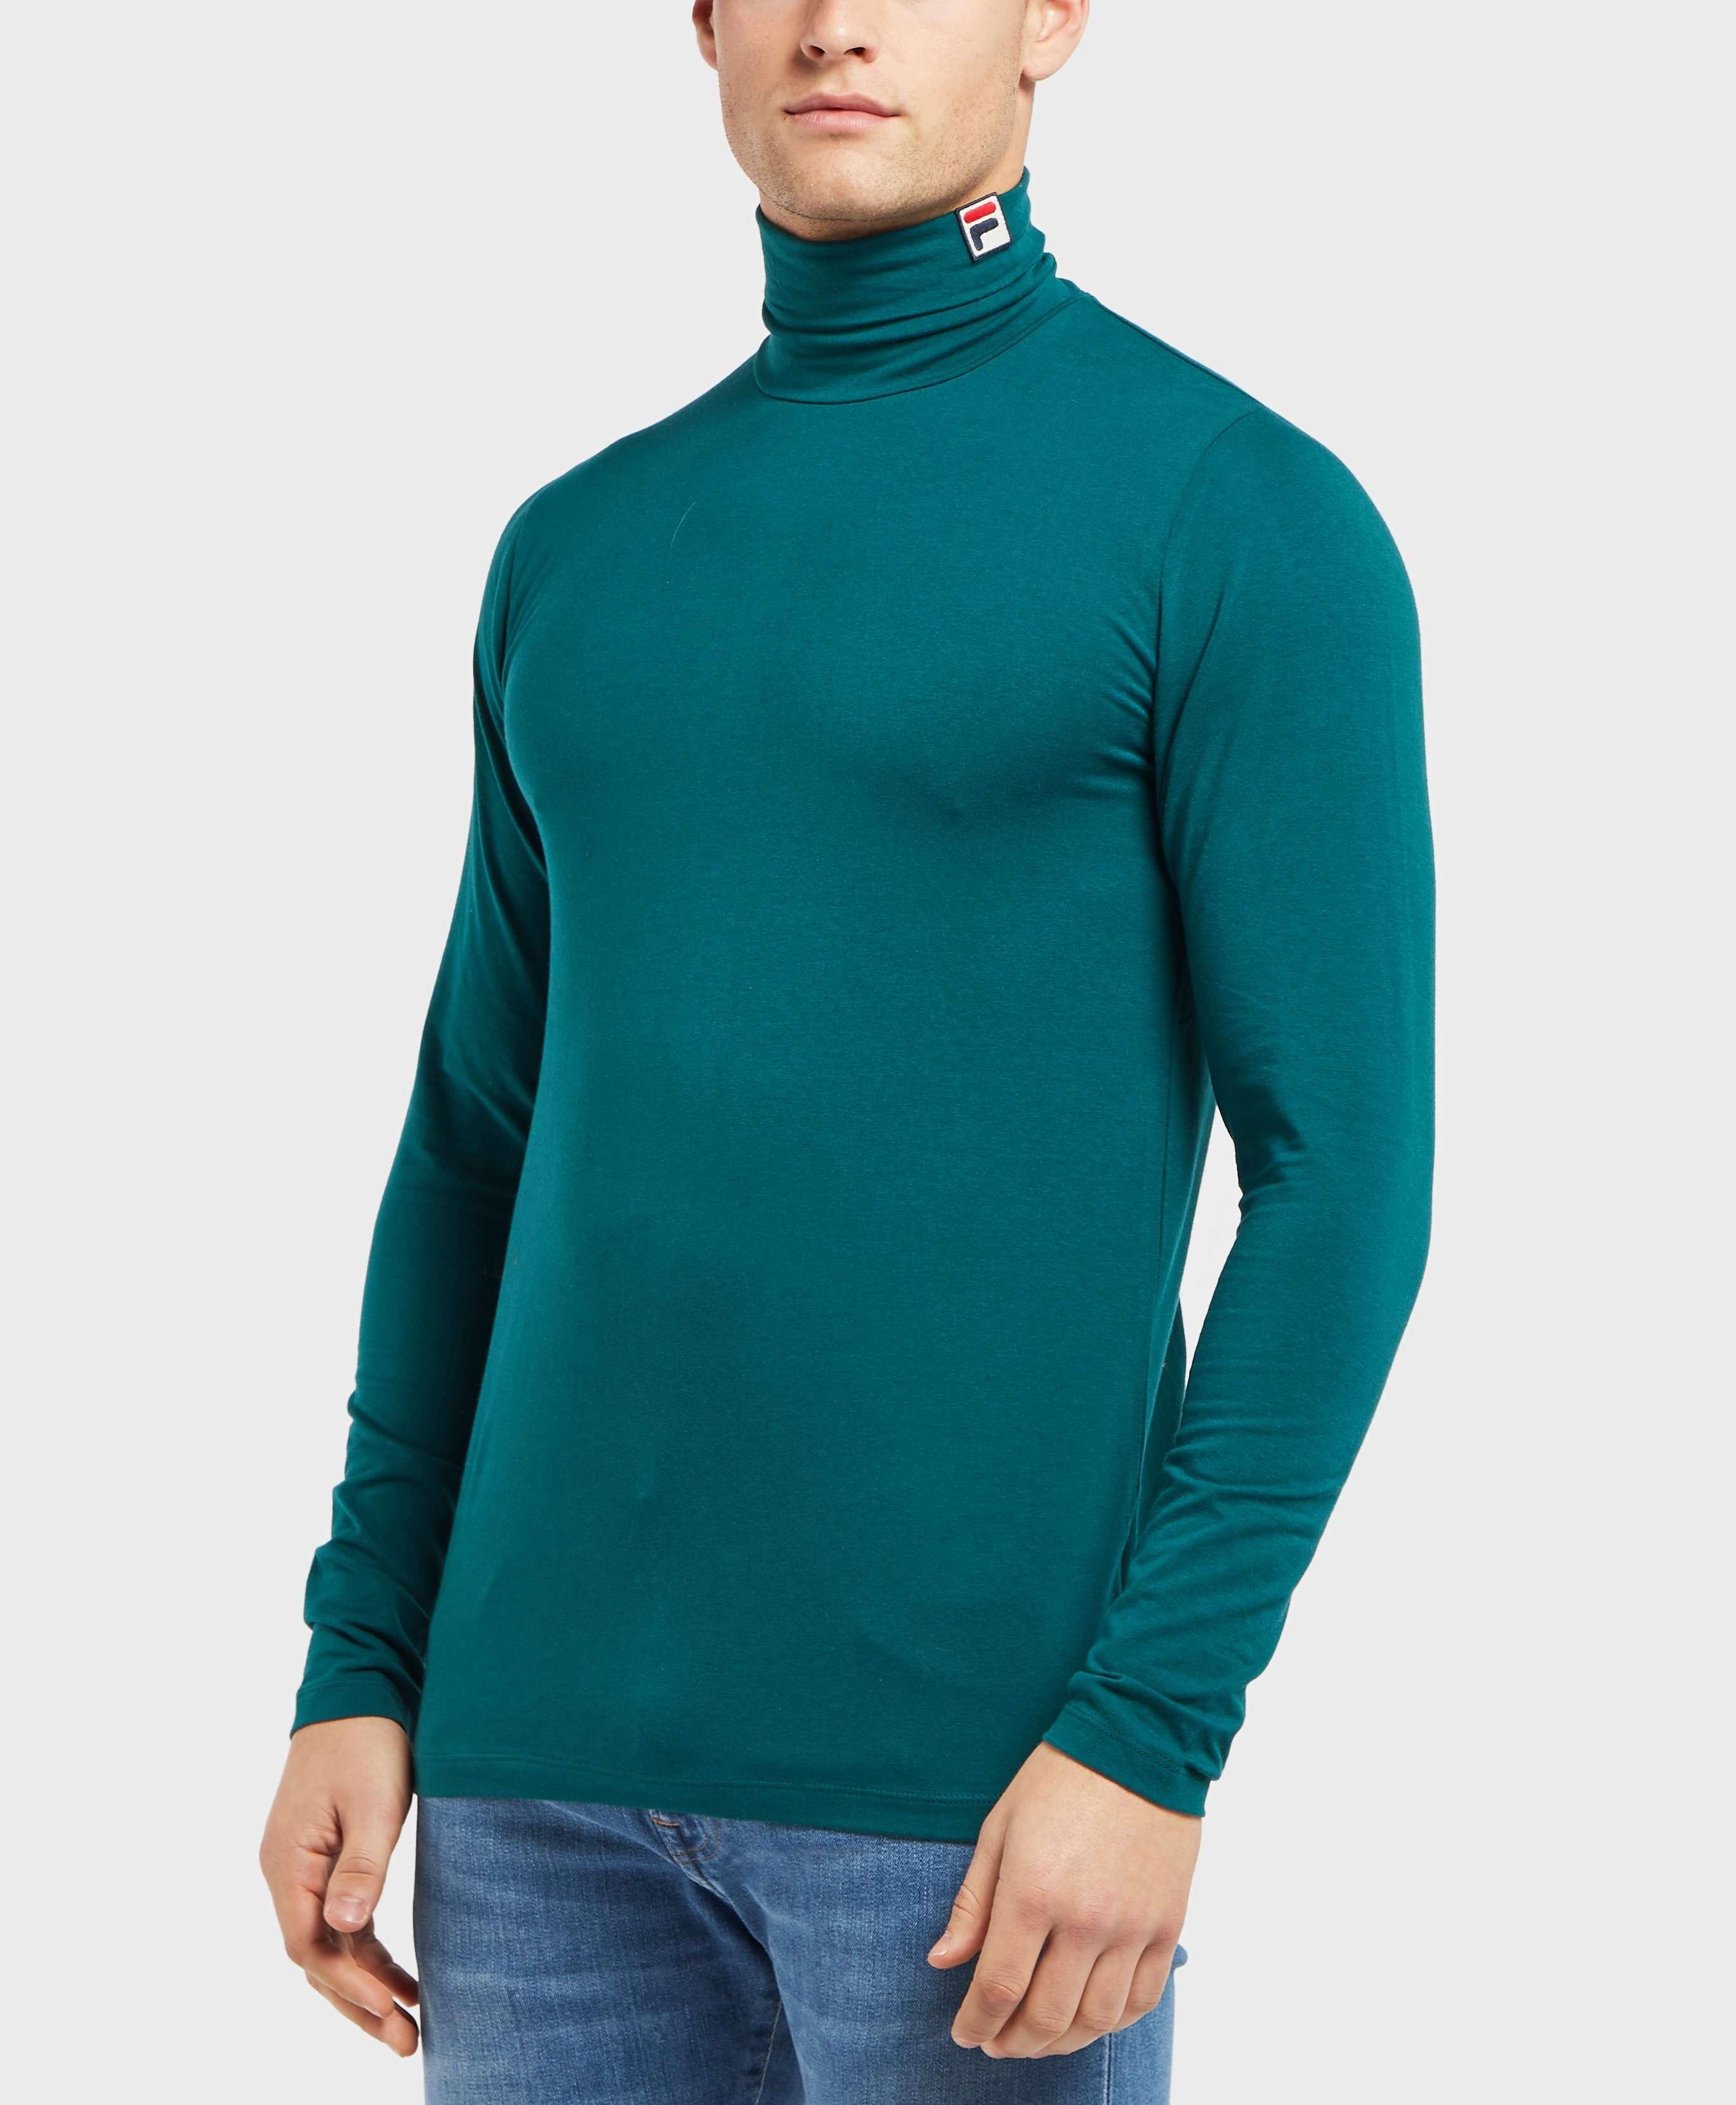 Fila Roll Neck Long Sleeve T-Shirt